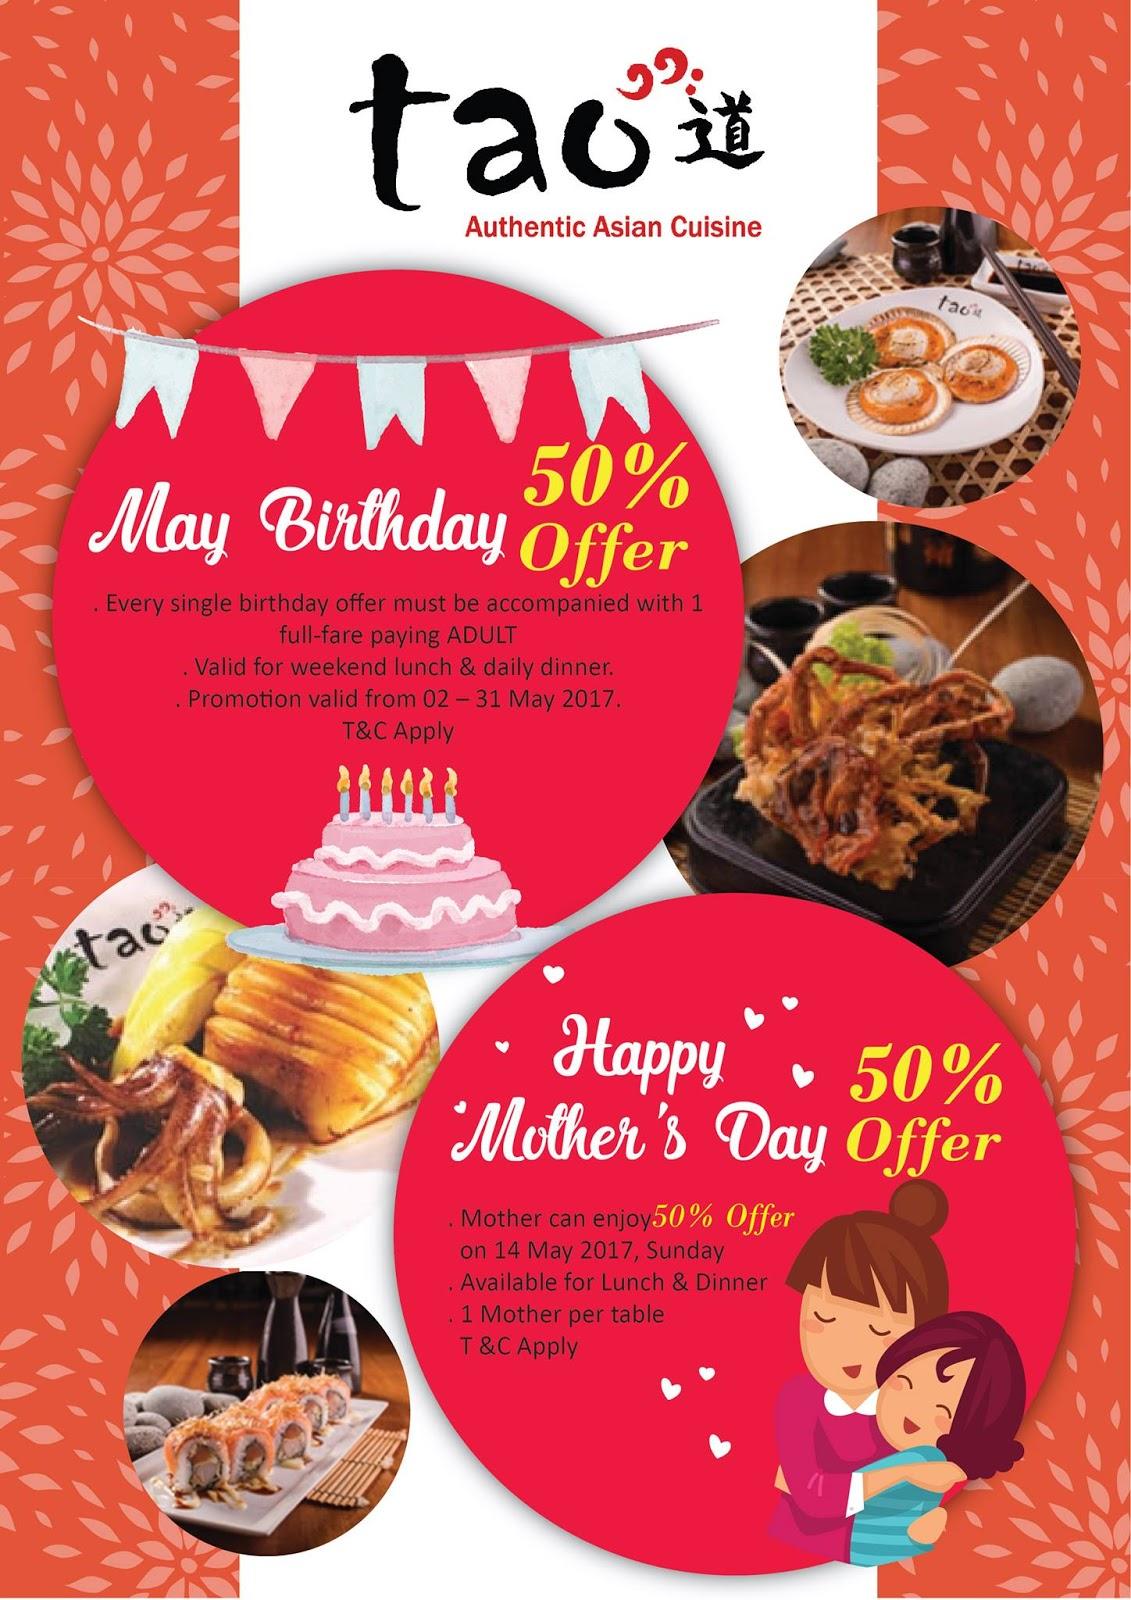 Tao authentic asian cuisine buffet 50 discount for mother for Asian cuisine buffet